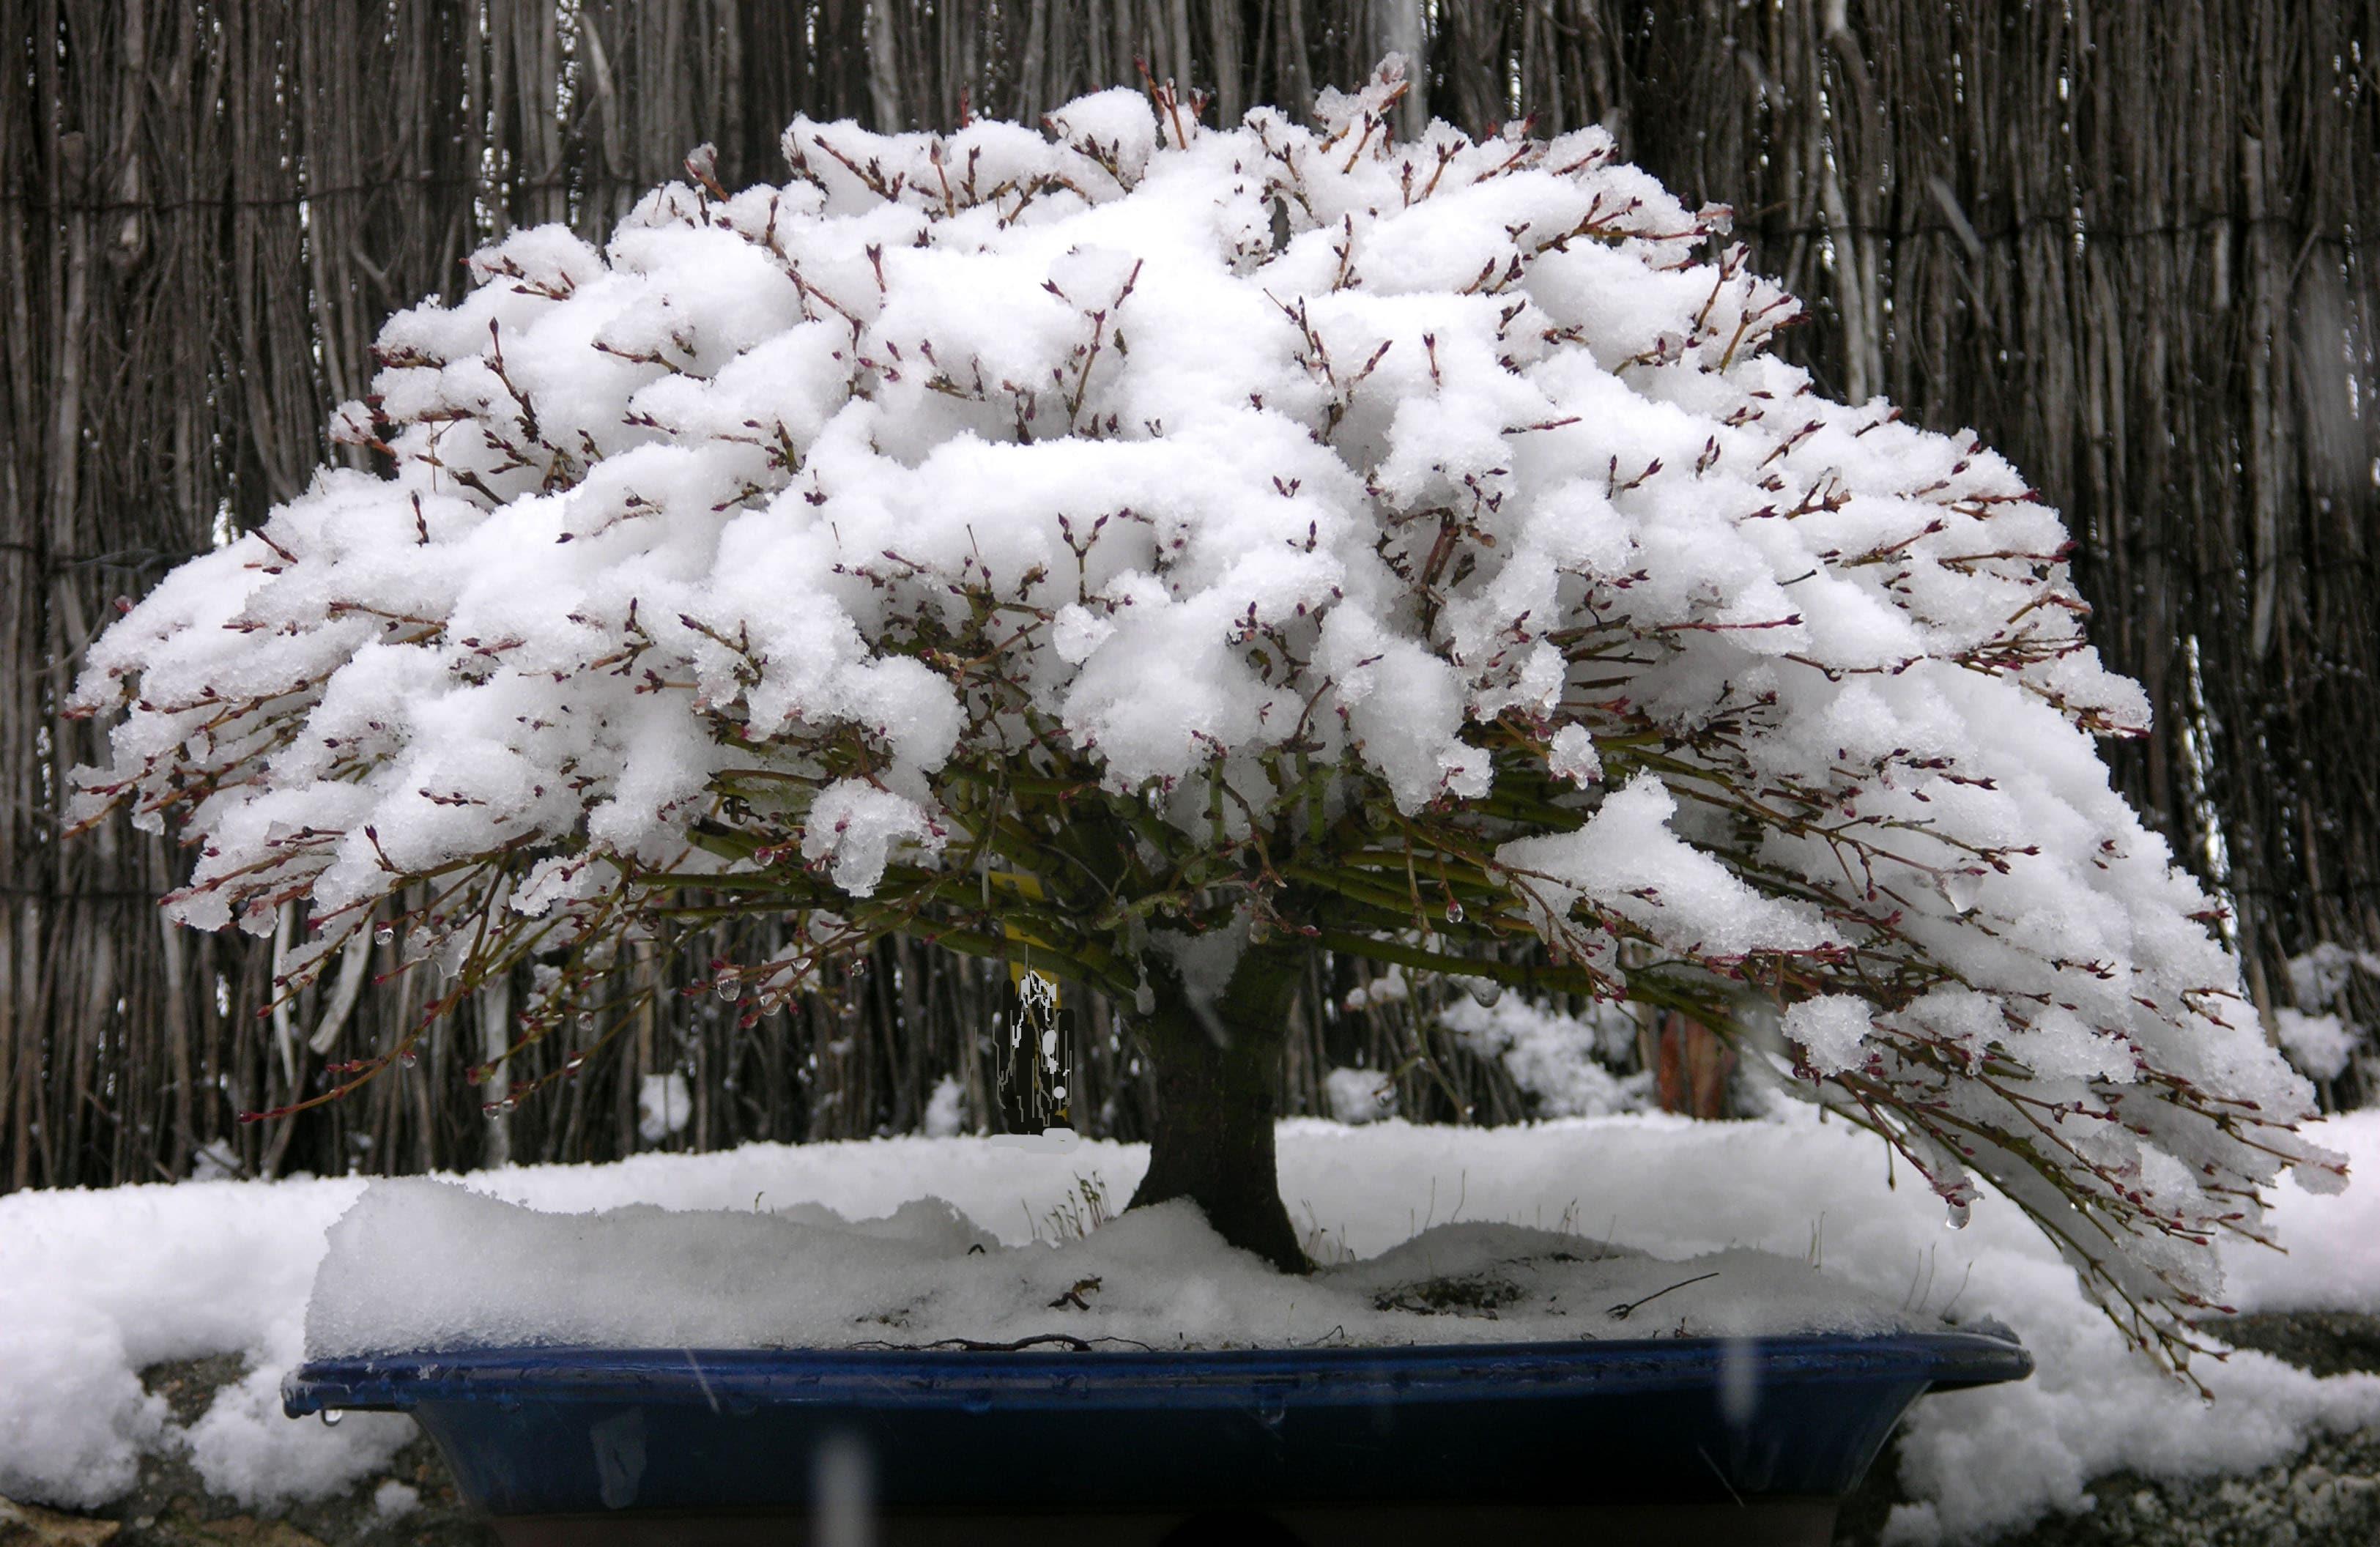 Nieve en el jard n de bons is blog bonsai colmenarblog - Jardin de bonsais ...